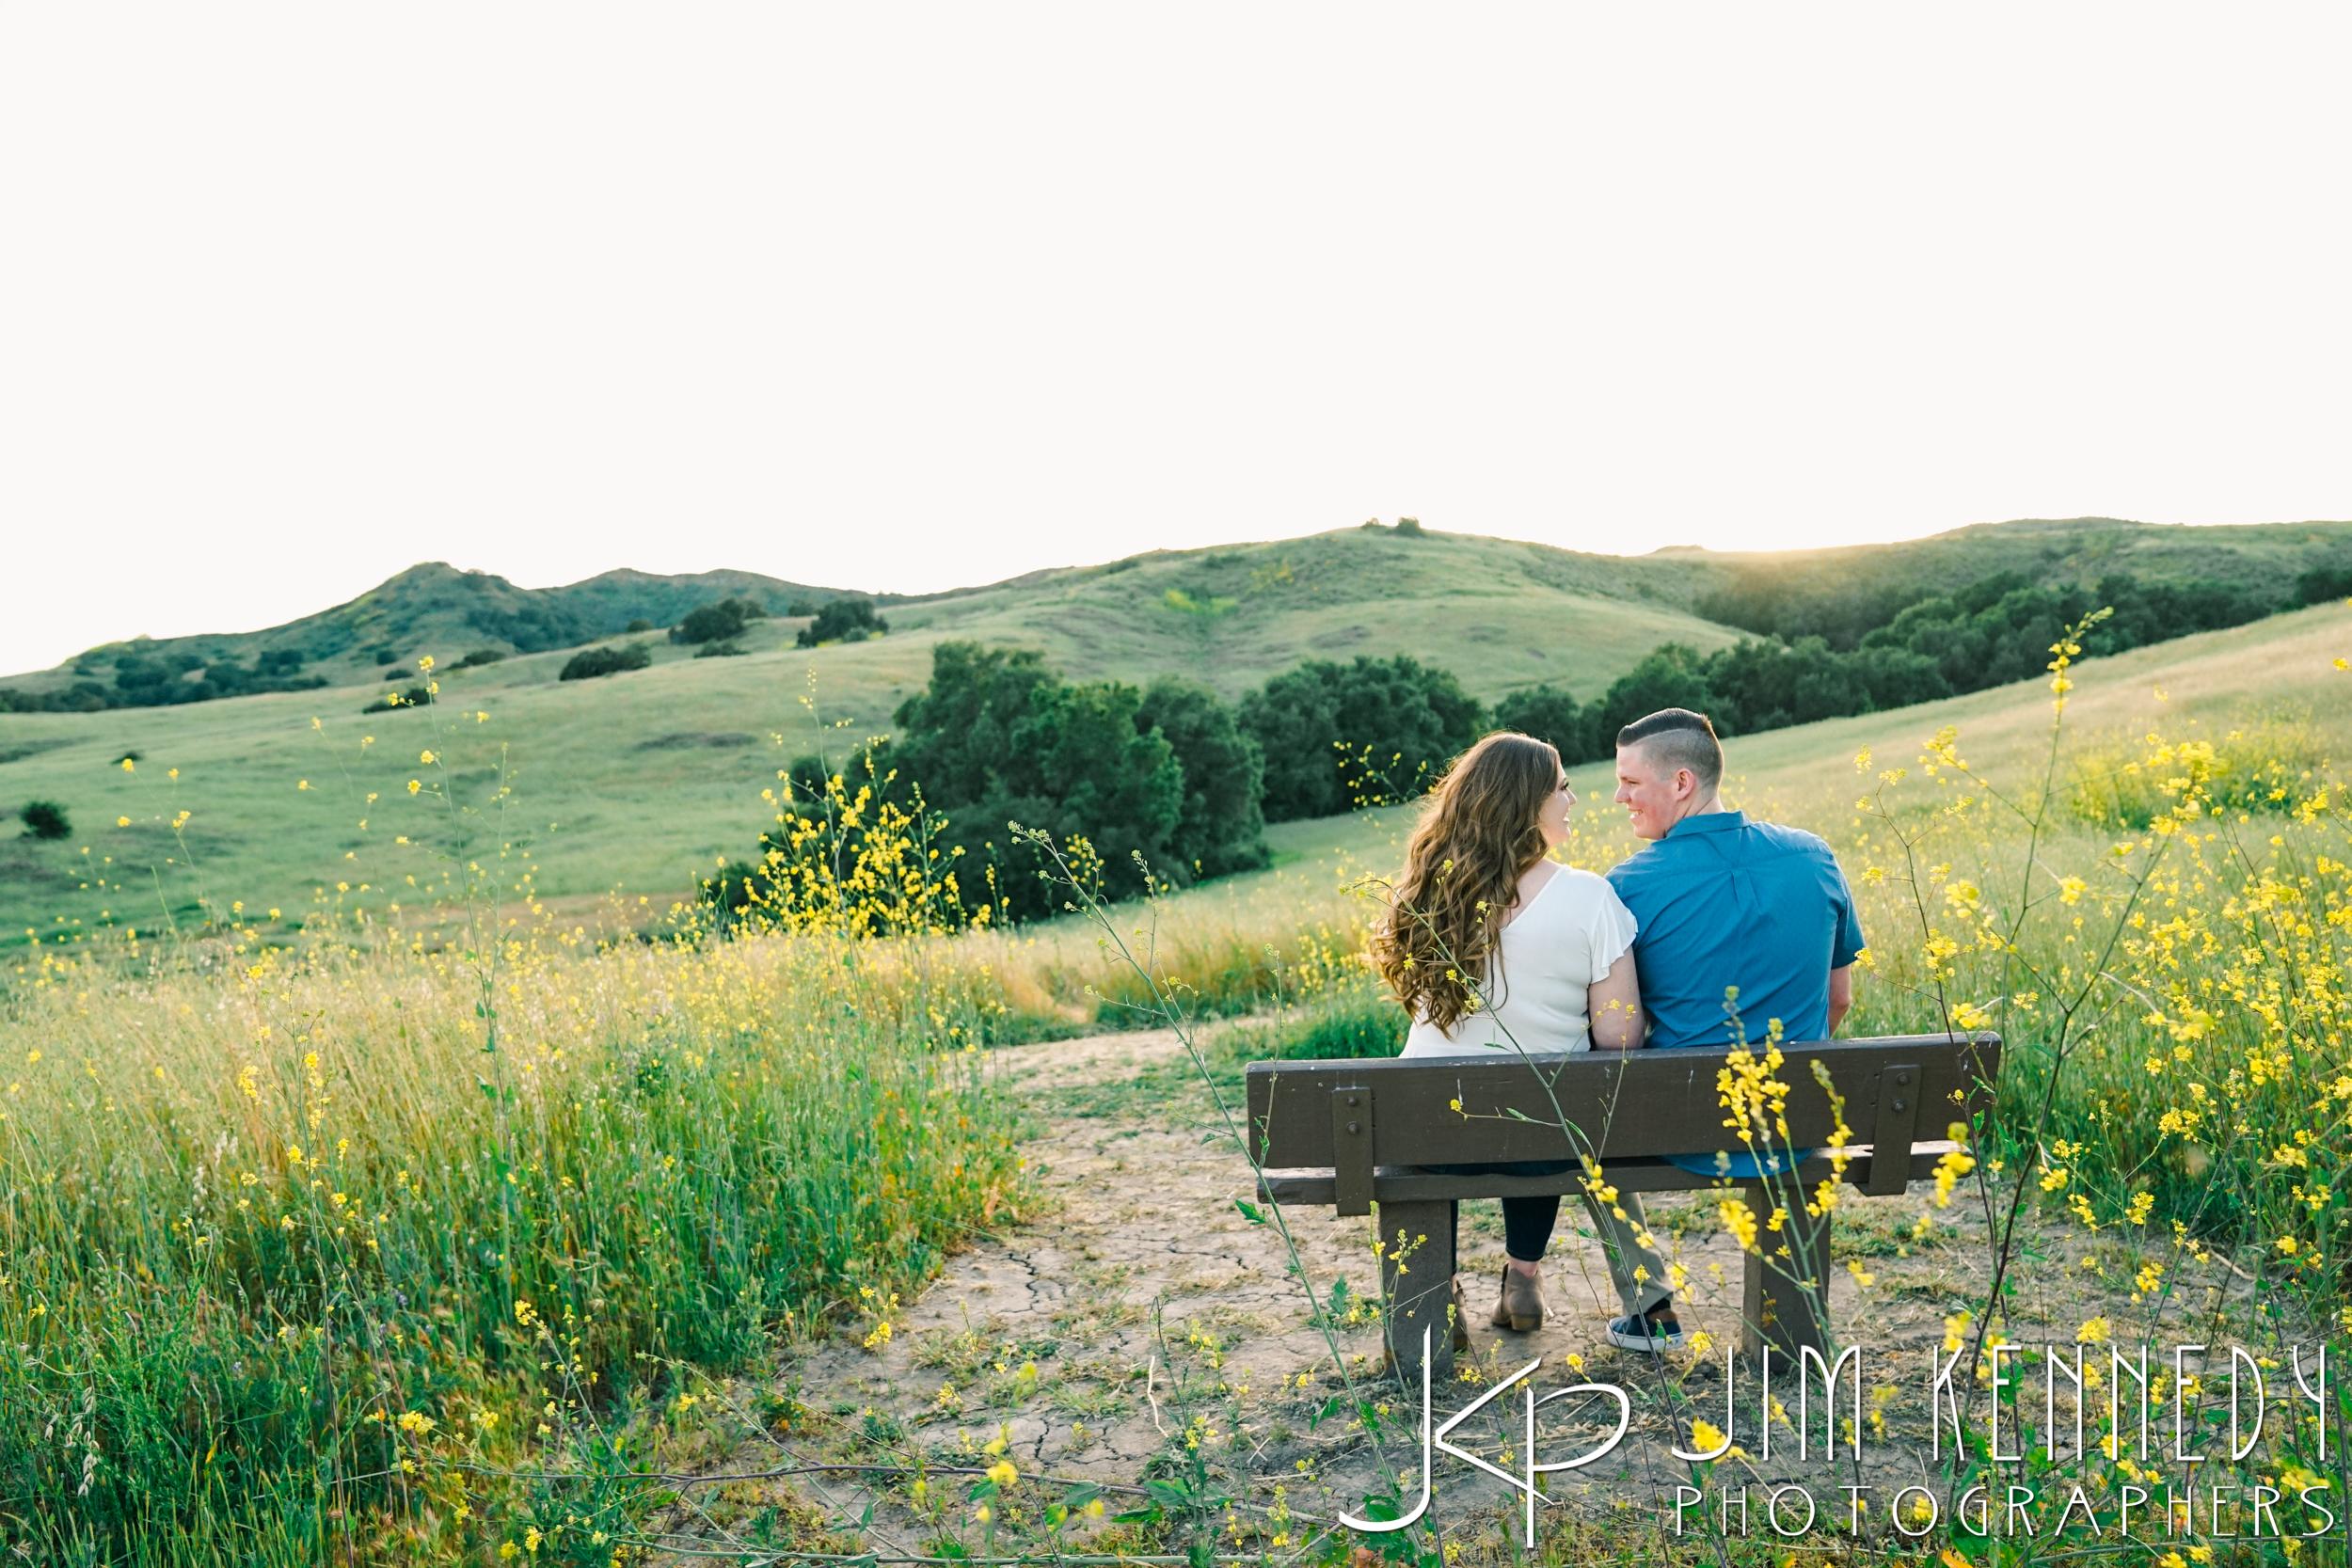 Thomas-F-Riley-Wilderness-Park-Engagement-0052.JPG